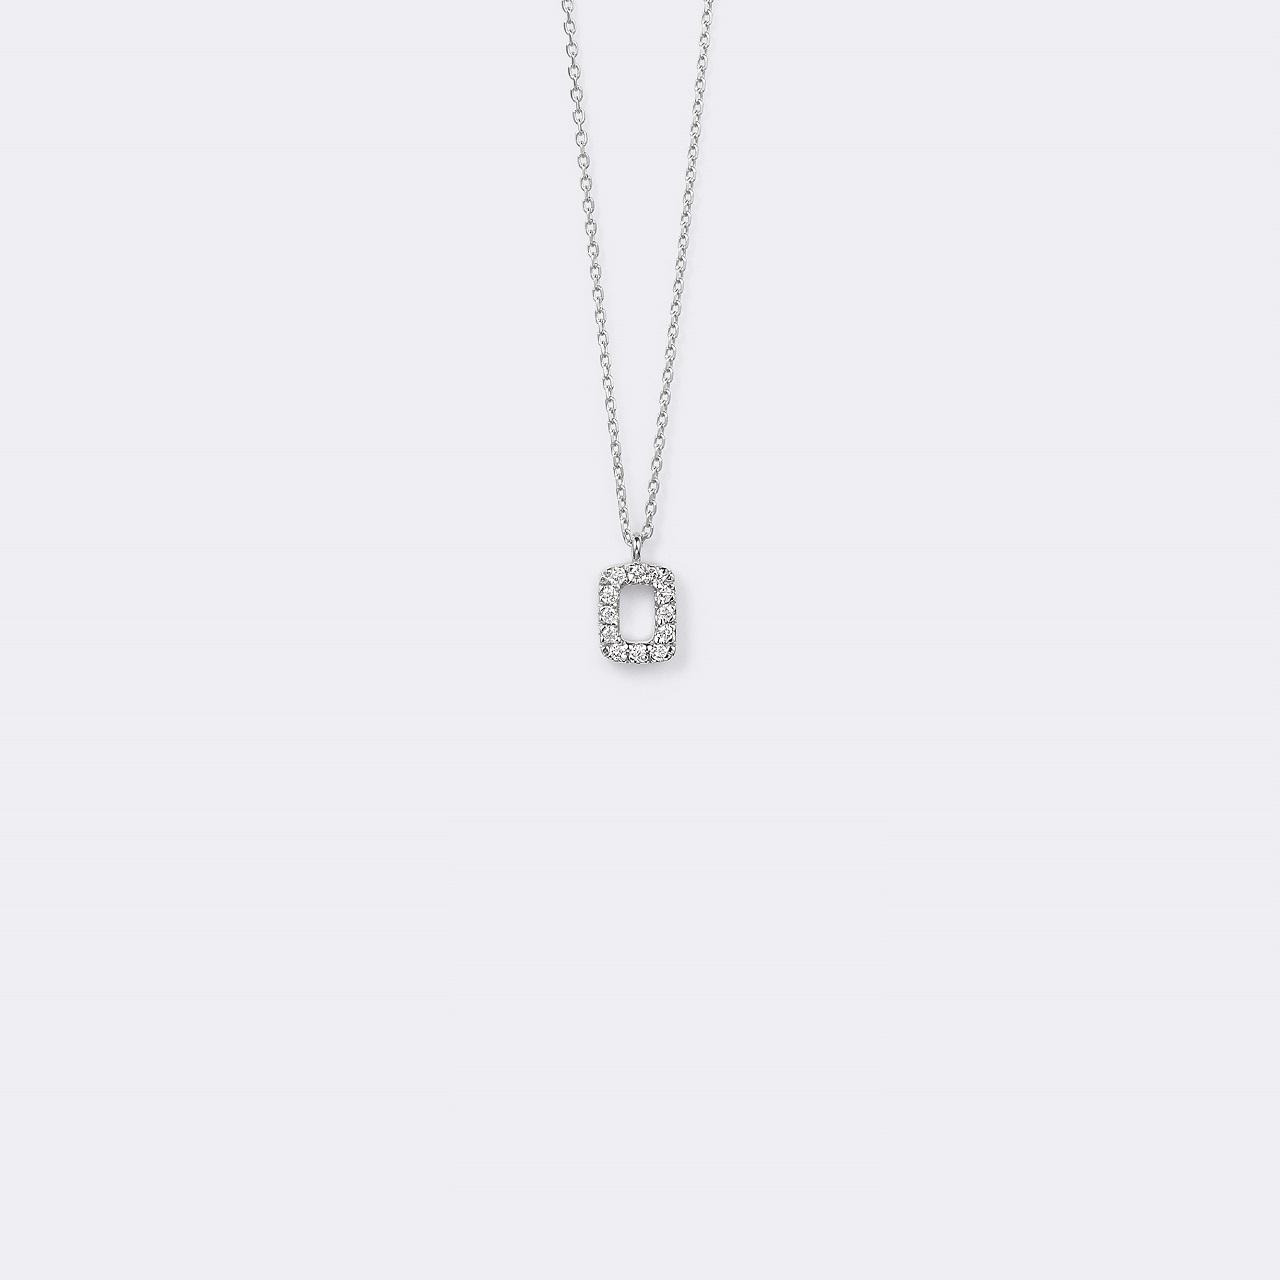 Pietra Necklace K18WG(ピエトラネックレス K18ホワイトゴールド)